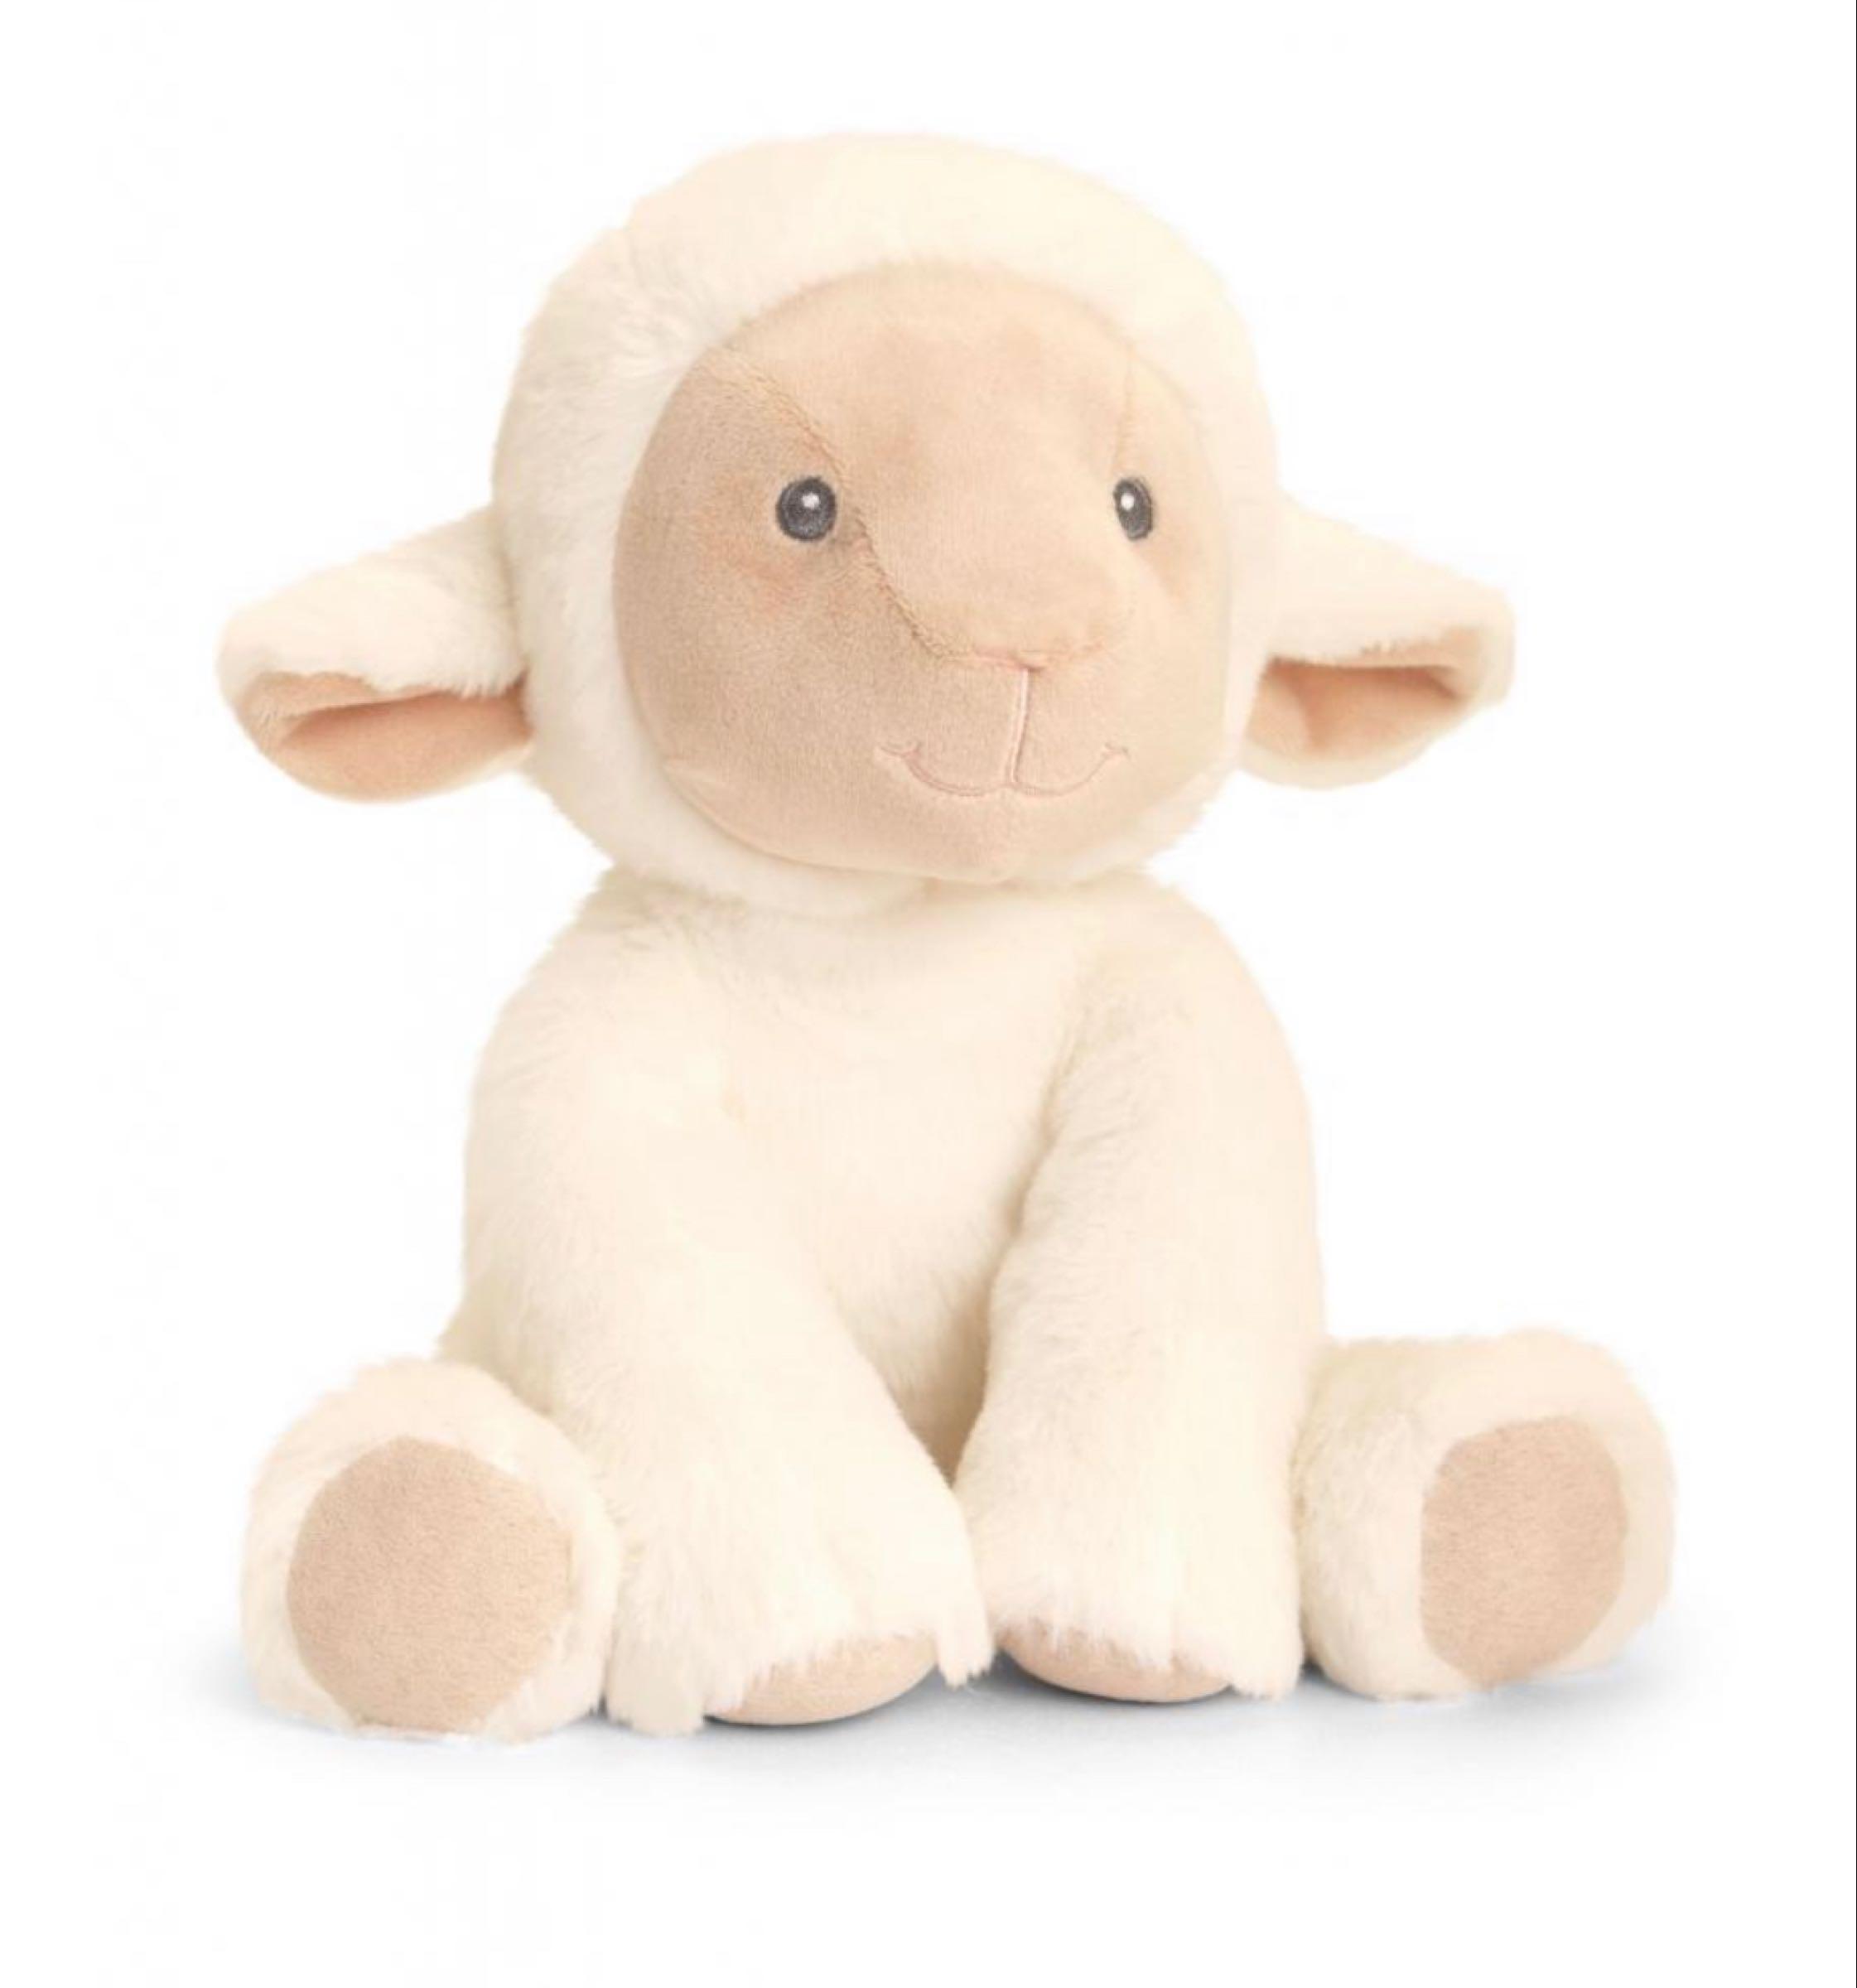 25cm Eco Lullaby Lamb